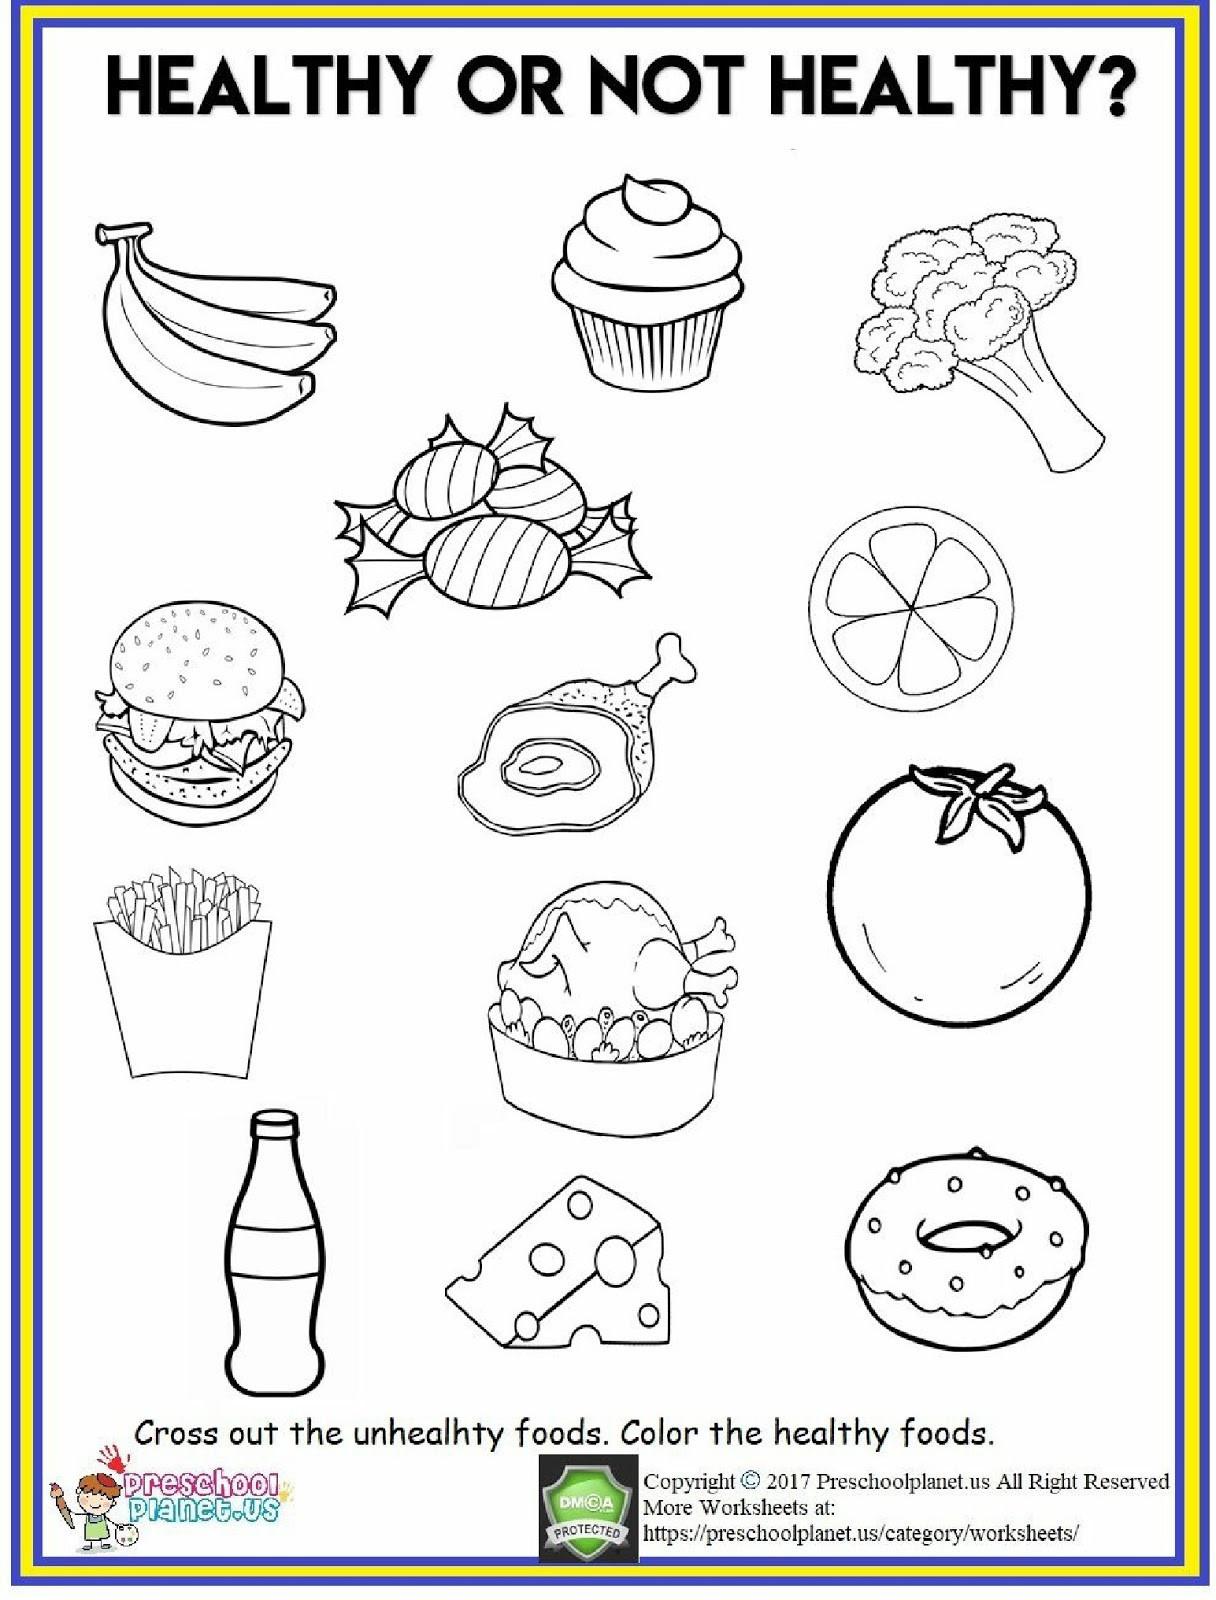 Vegetable Worksheets for Preschool 4 Food Worksheets Preschool Fruits and Ve Ables